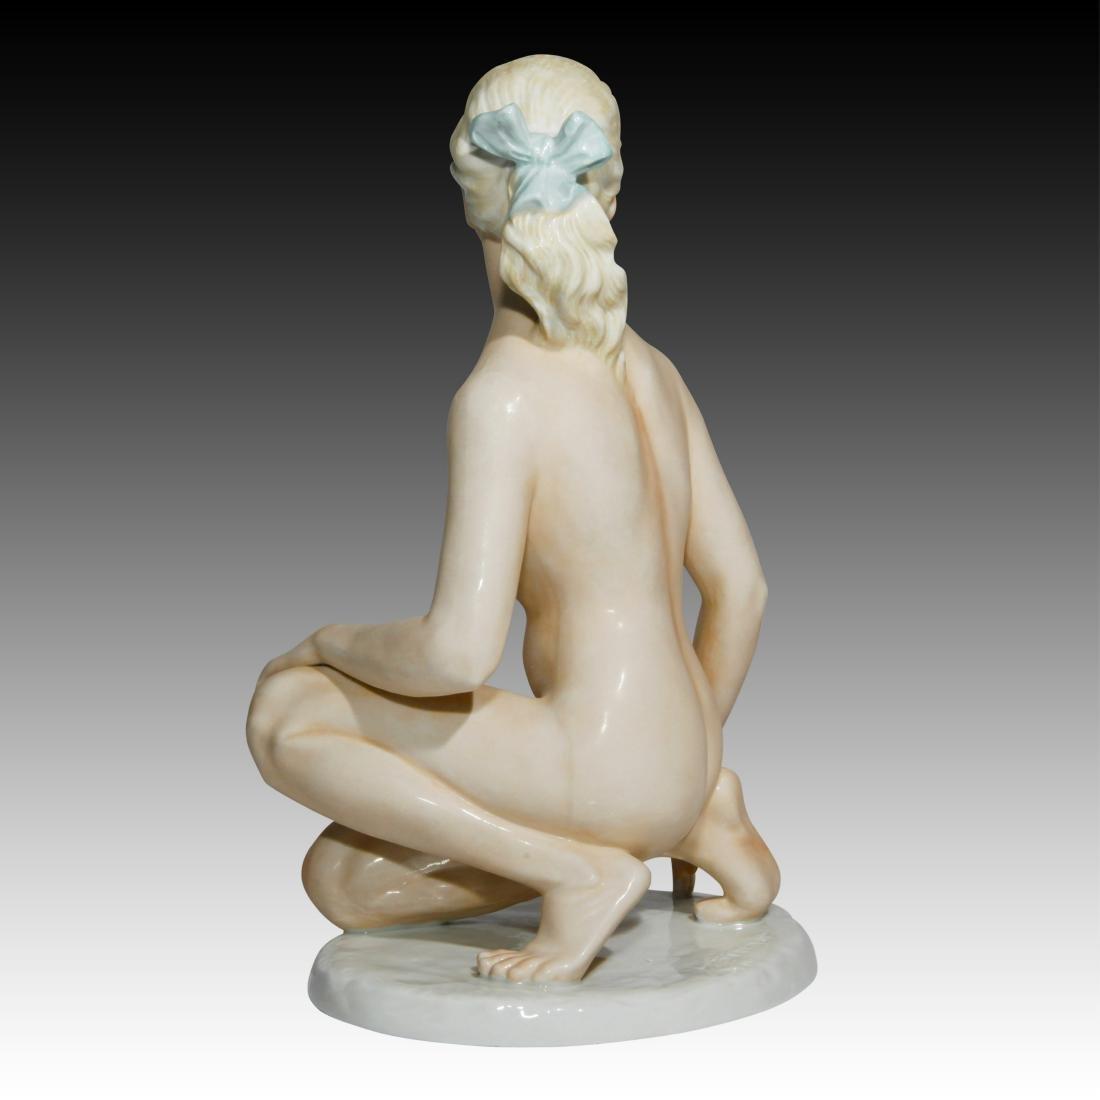 Shaubach Kunst Kneeling Blonde Figurine 9365 - 2